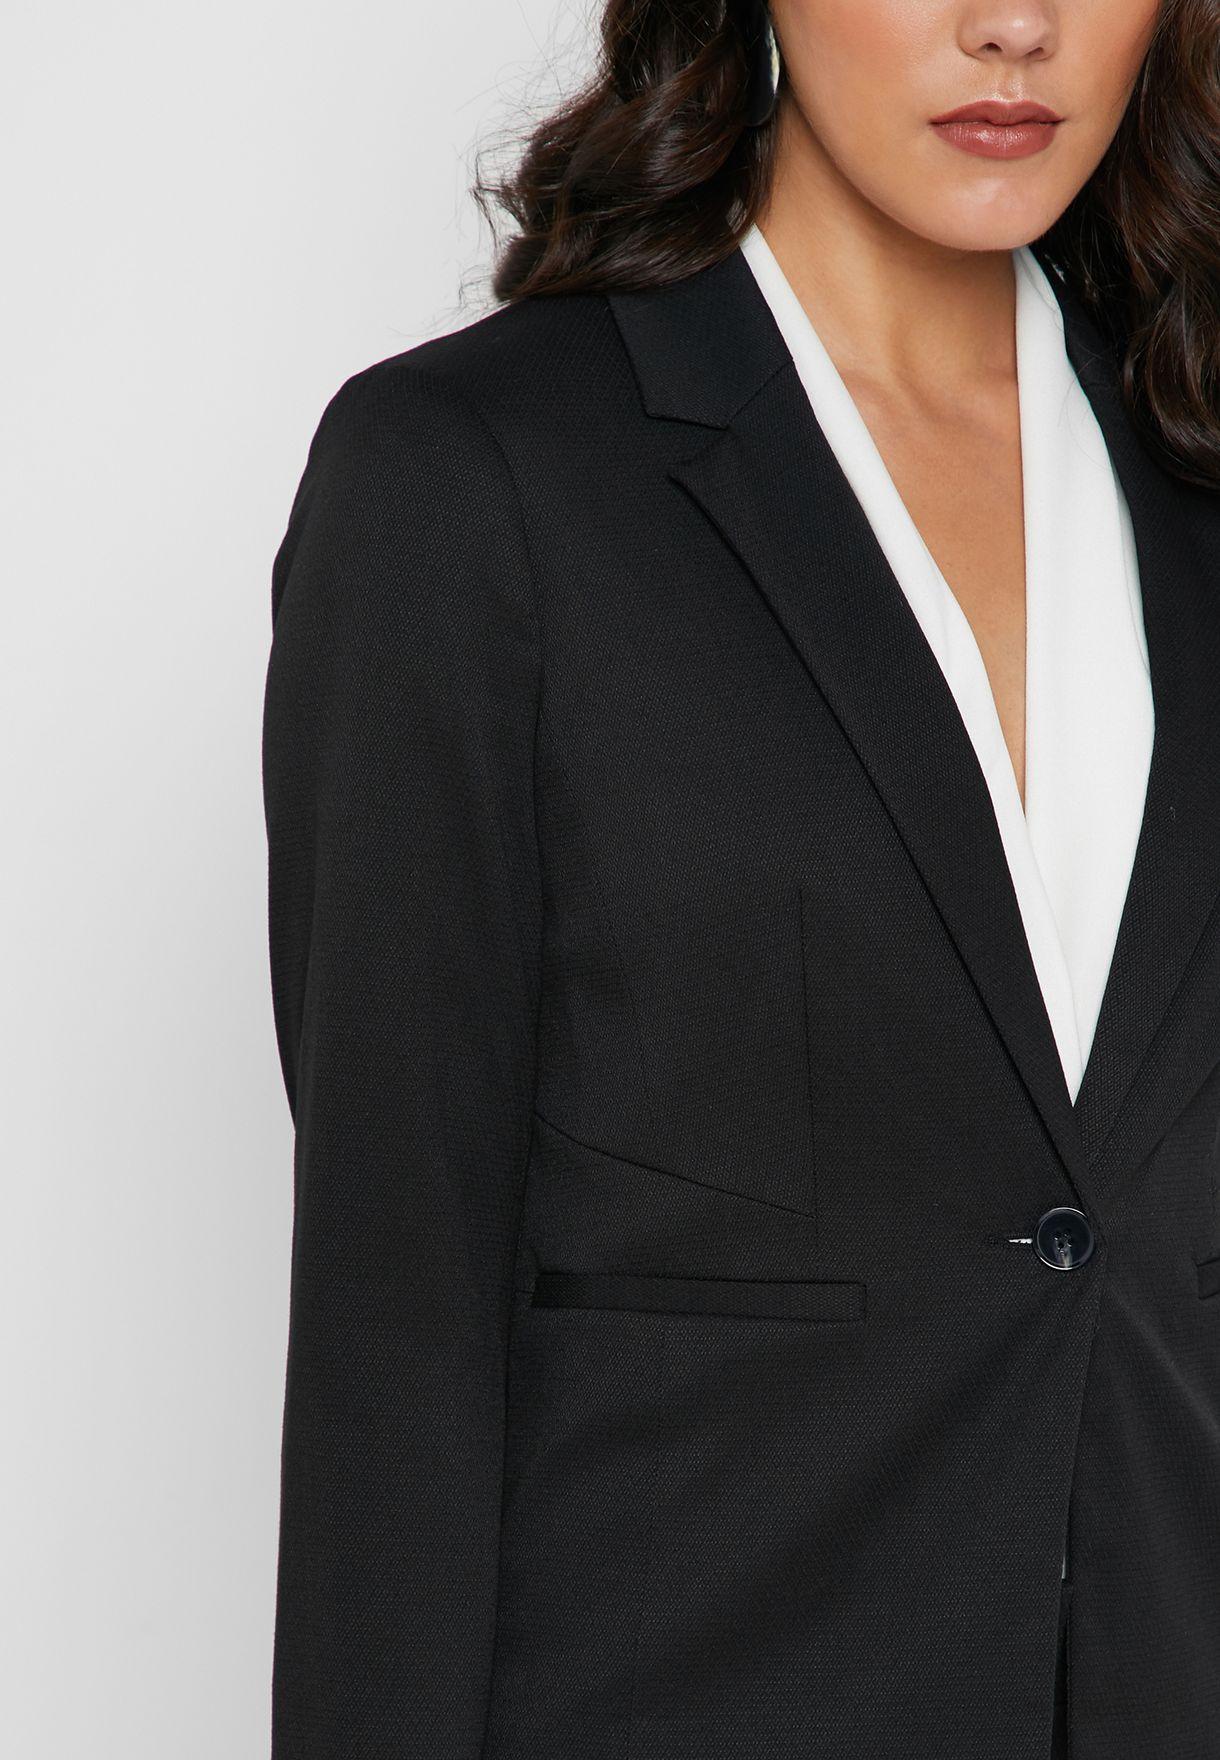 Black Textured Jacket